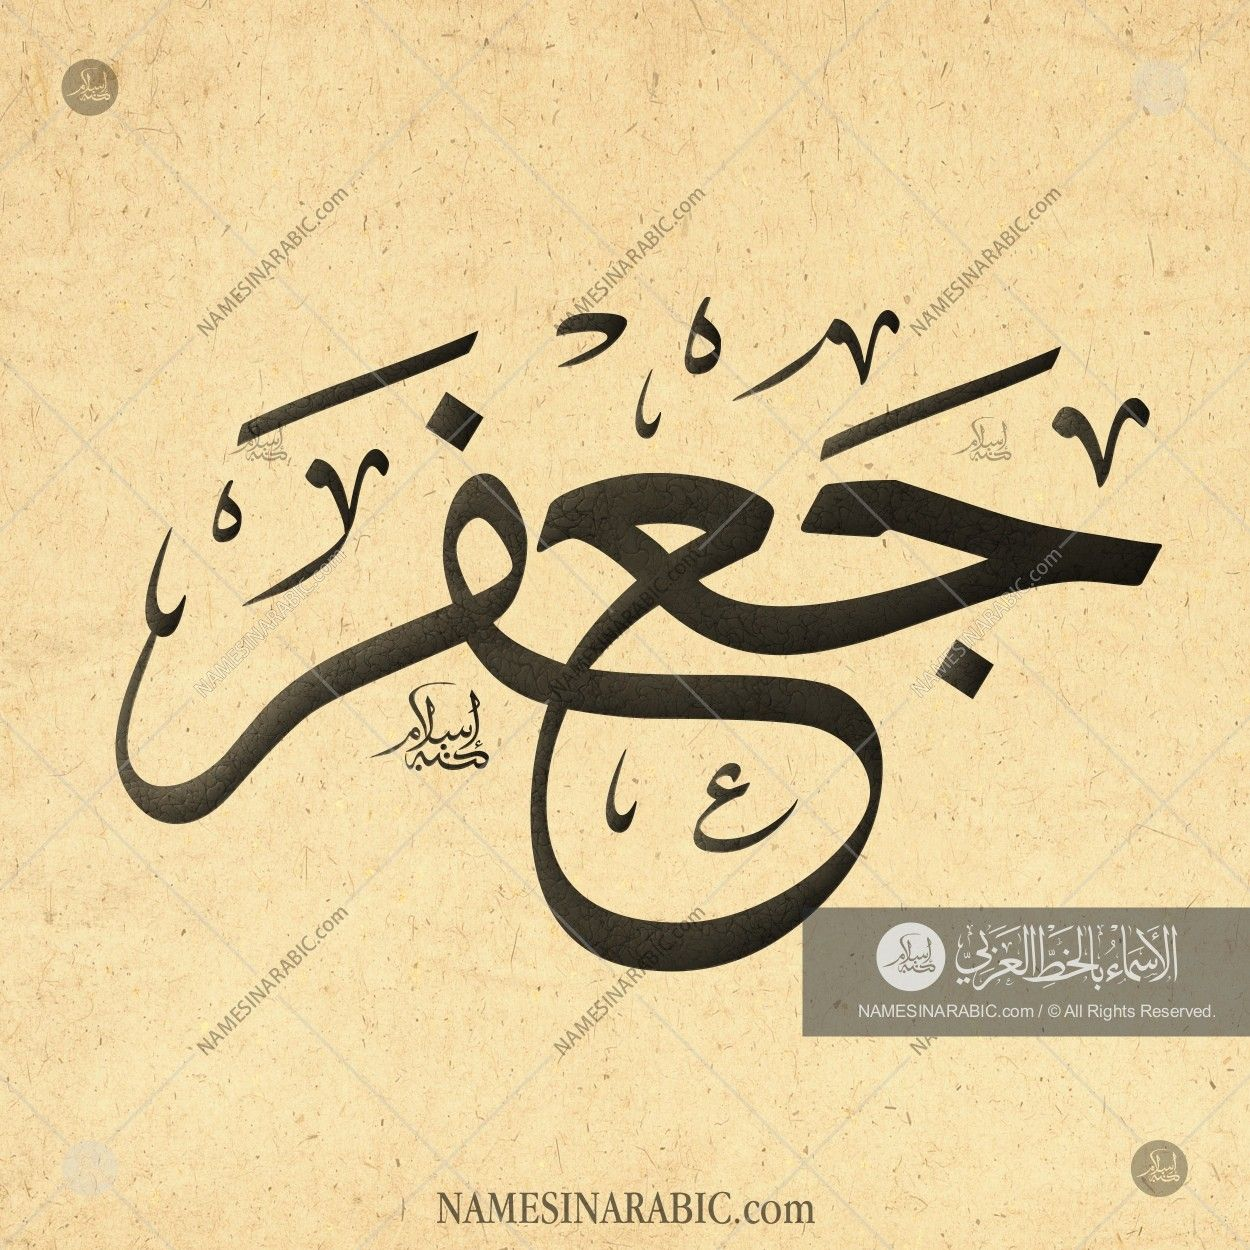 Jafar جعفر Names In Arabic Calligraphy Name 3021 Calligraphy Name Islamic Calligraphy Arabic Calligraphy